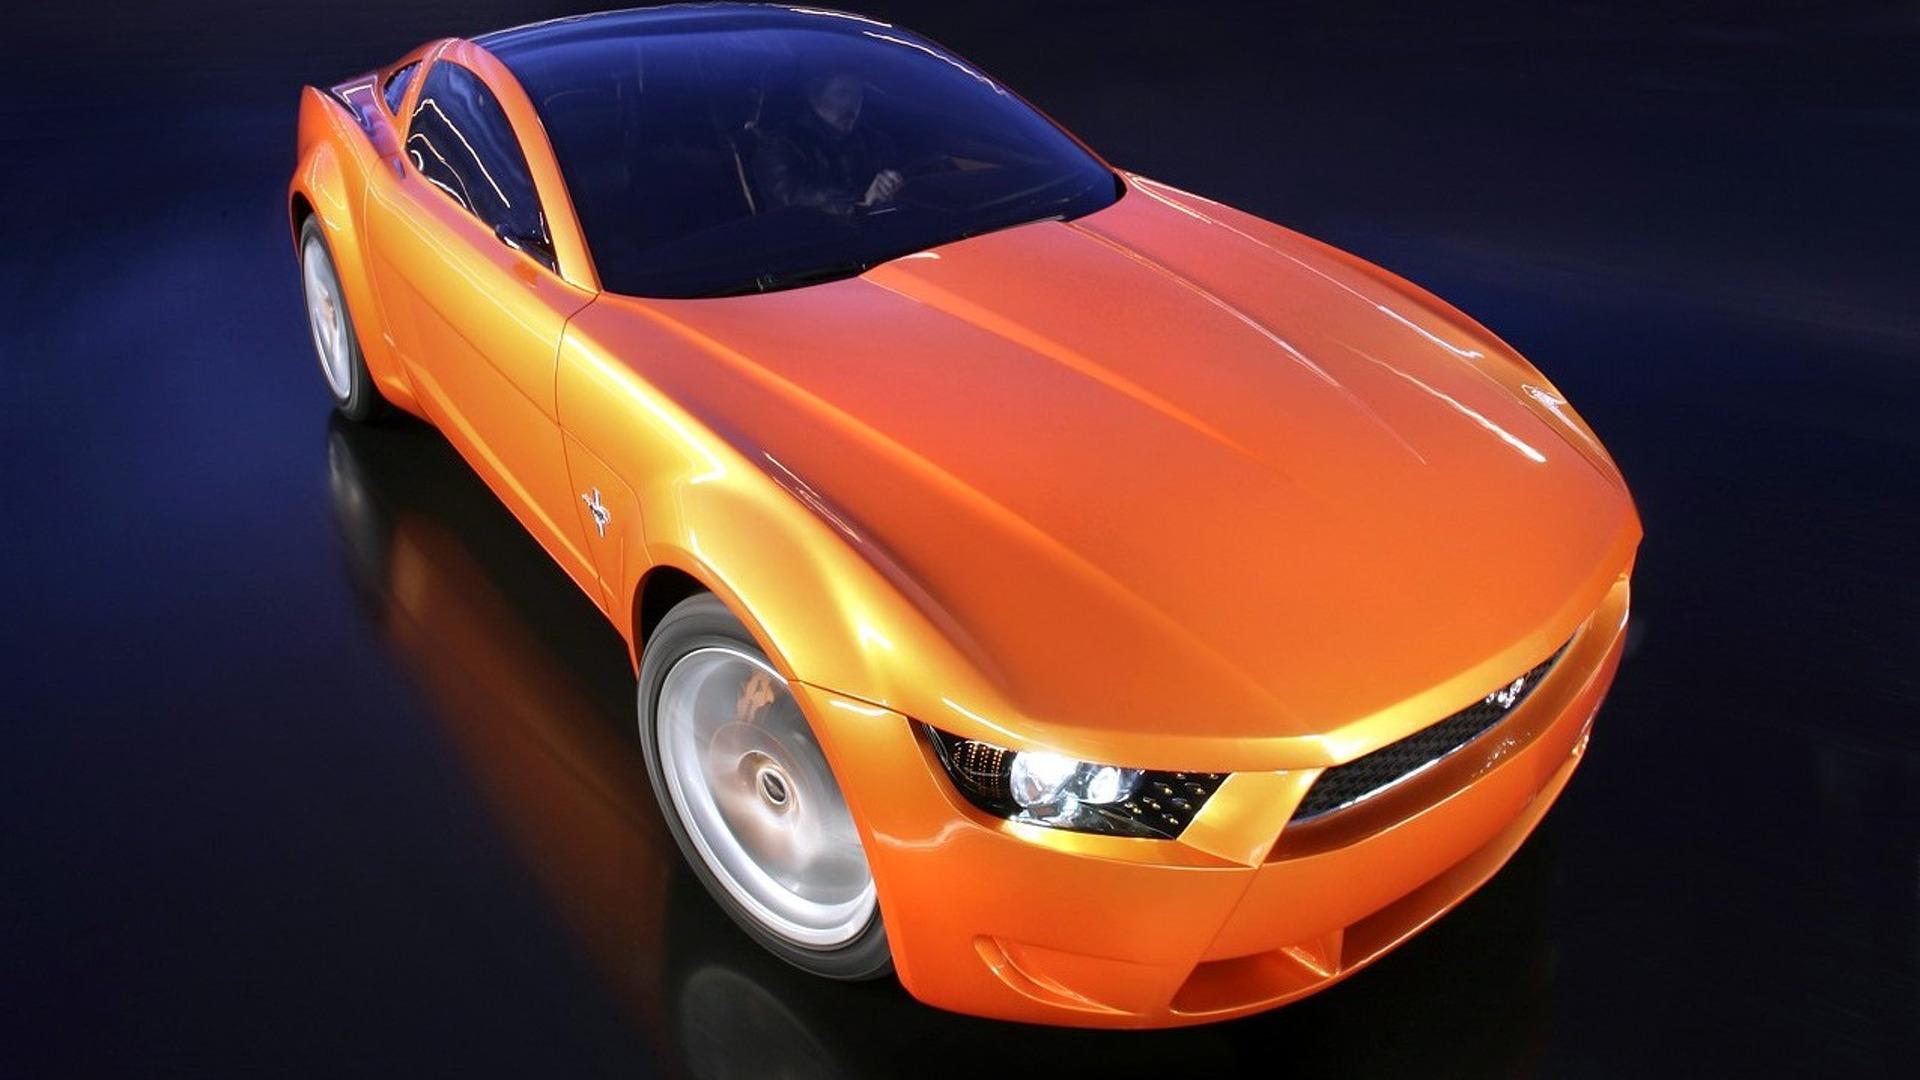 2006-ford-mustang-giugiaro-concept (3)